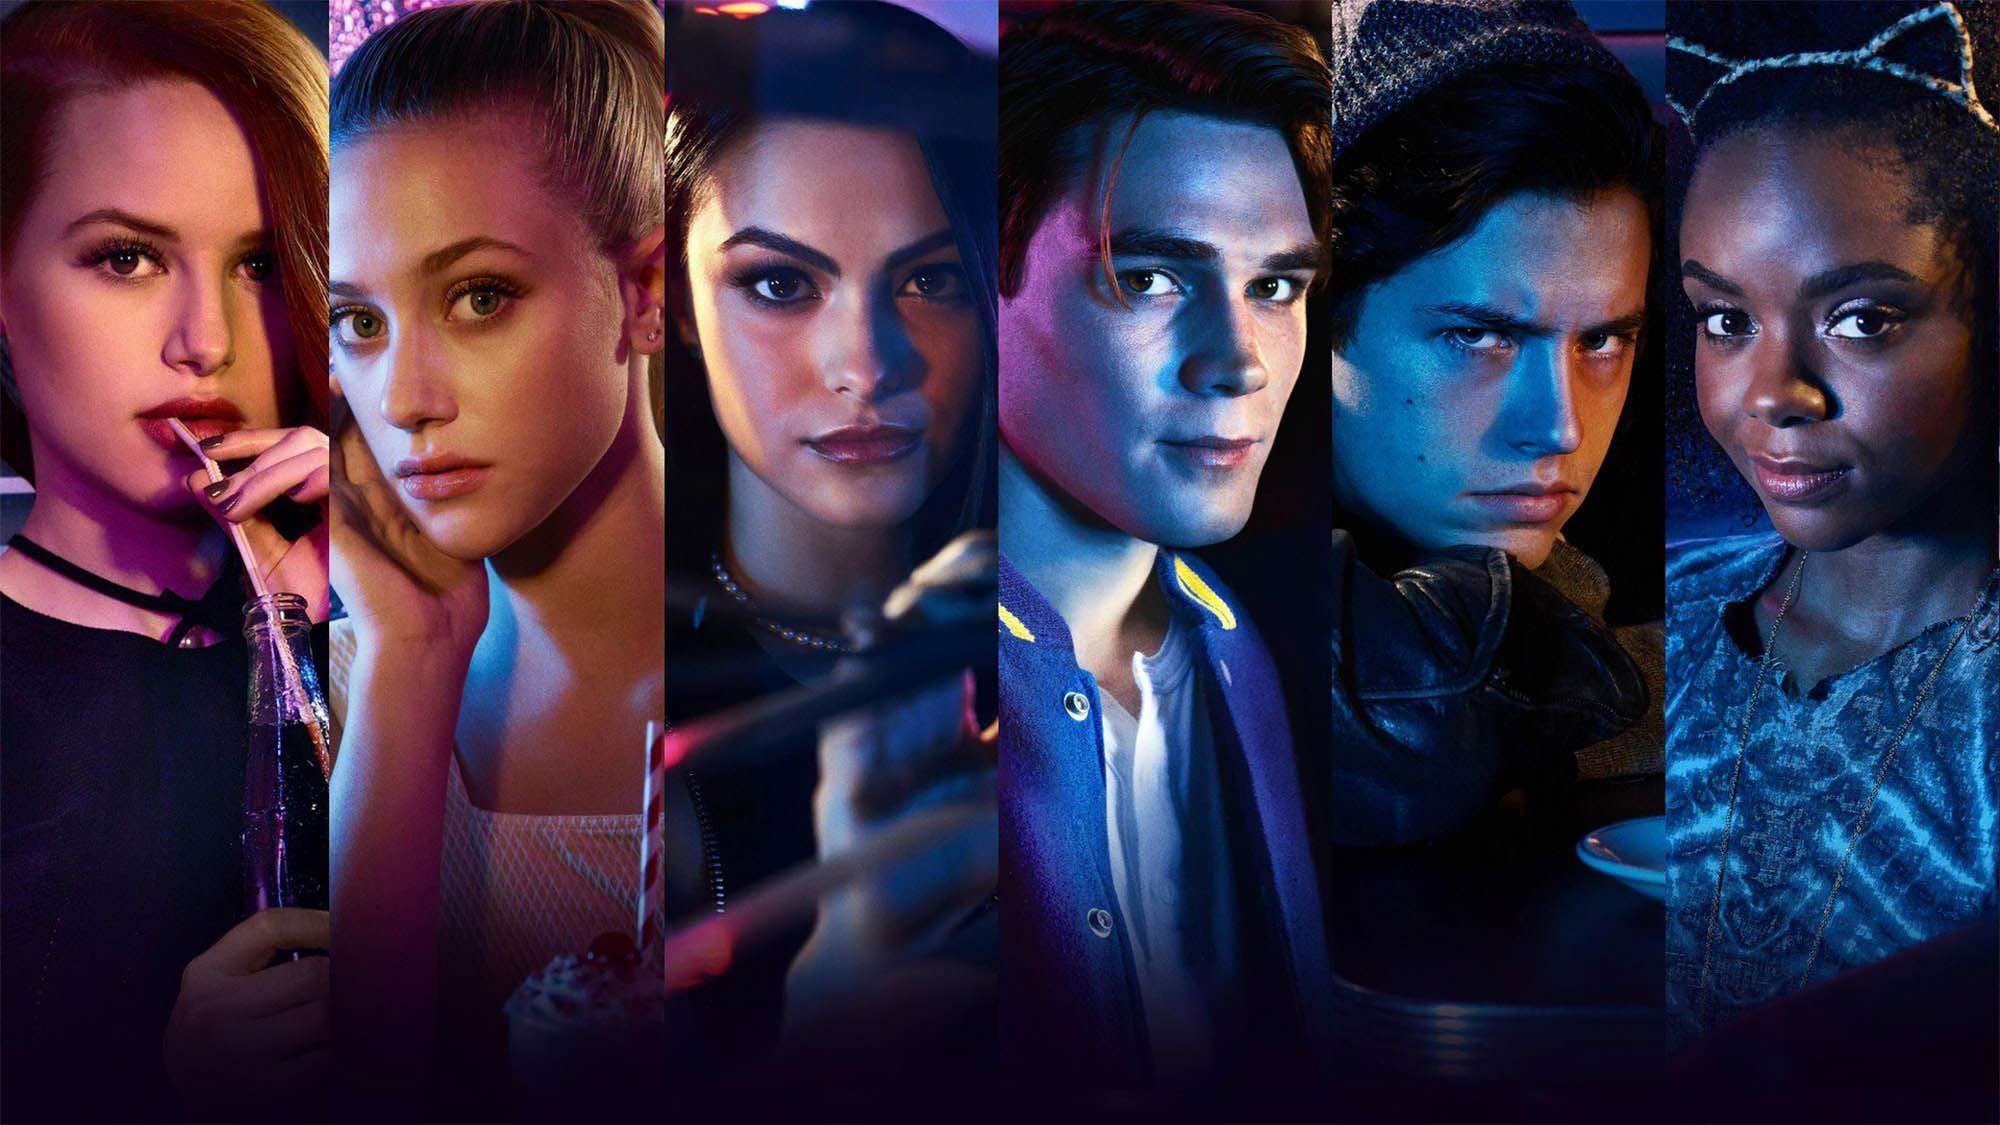 Fondos de pantalla Personajes de Riverdale